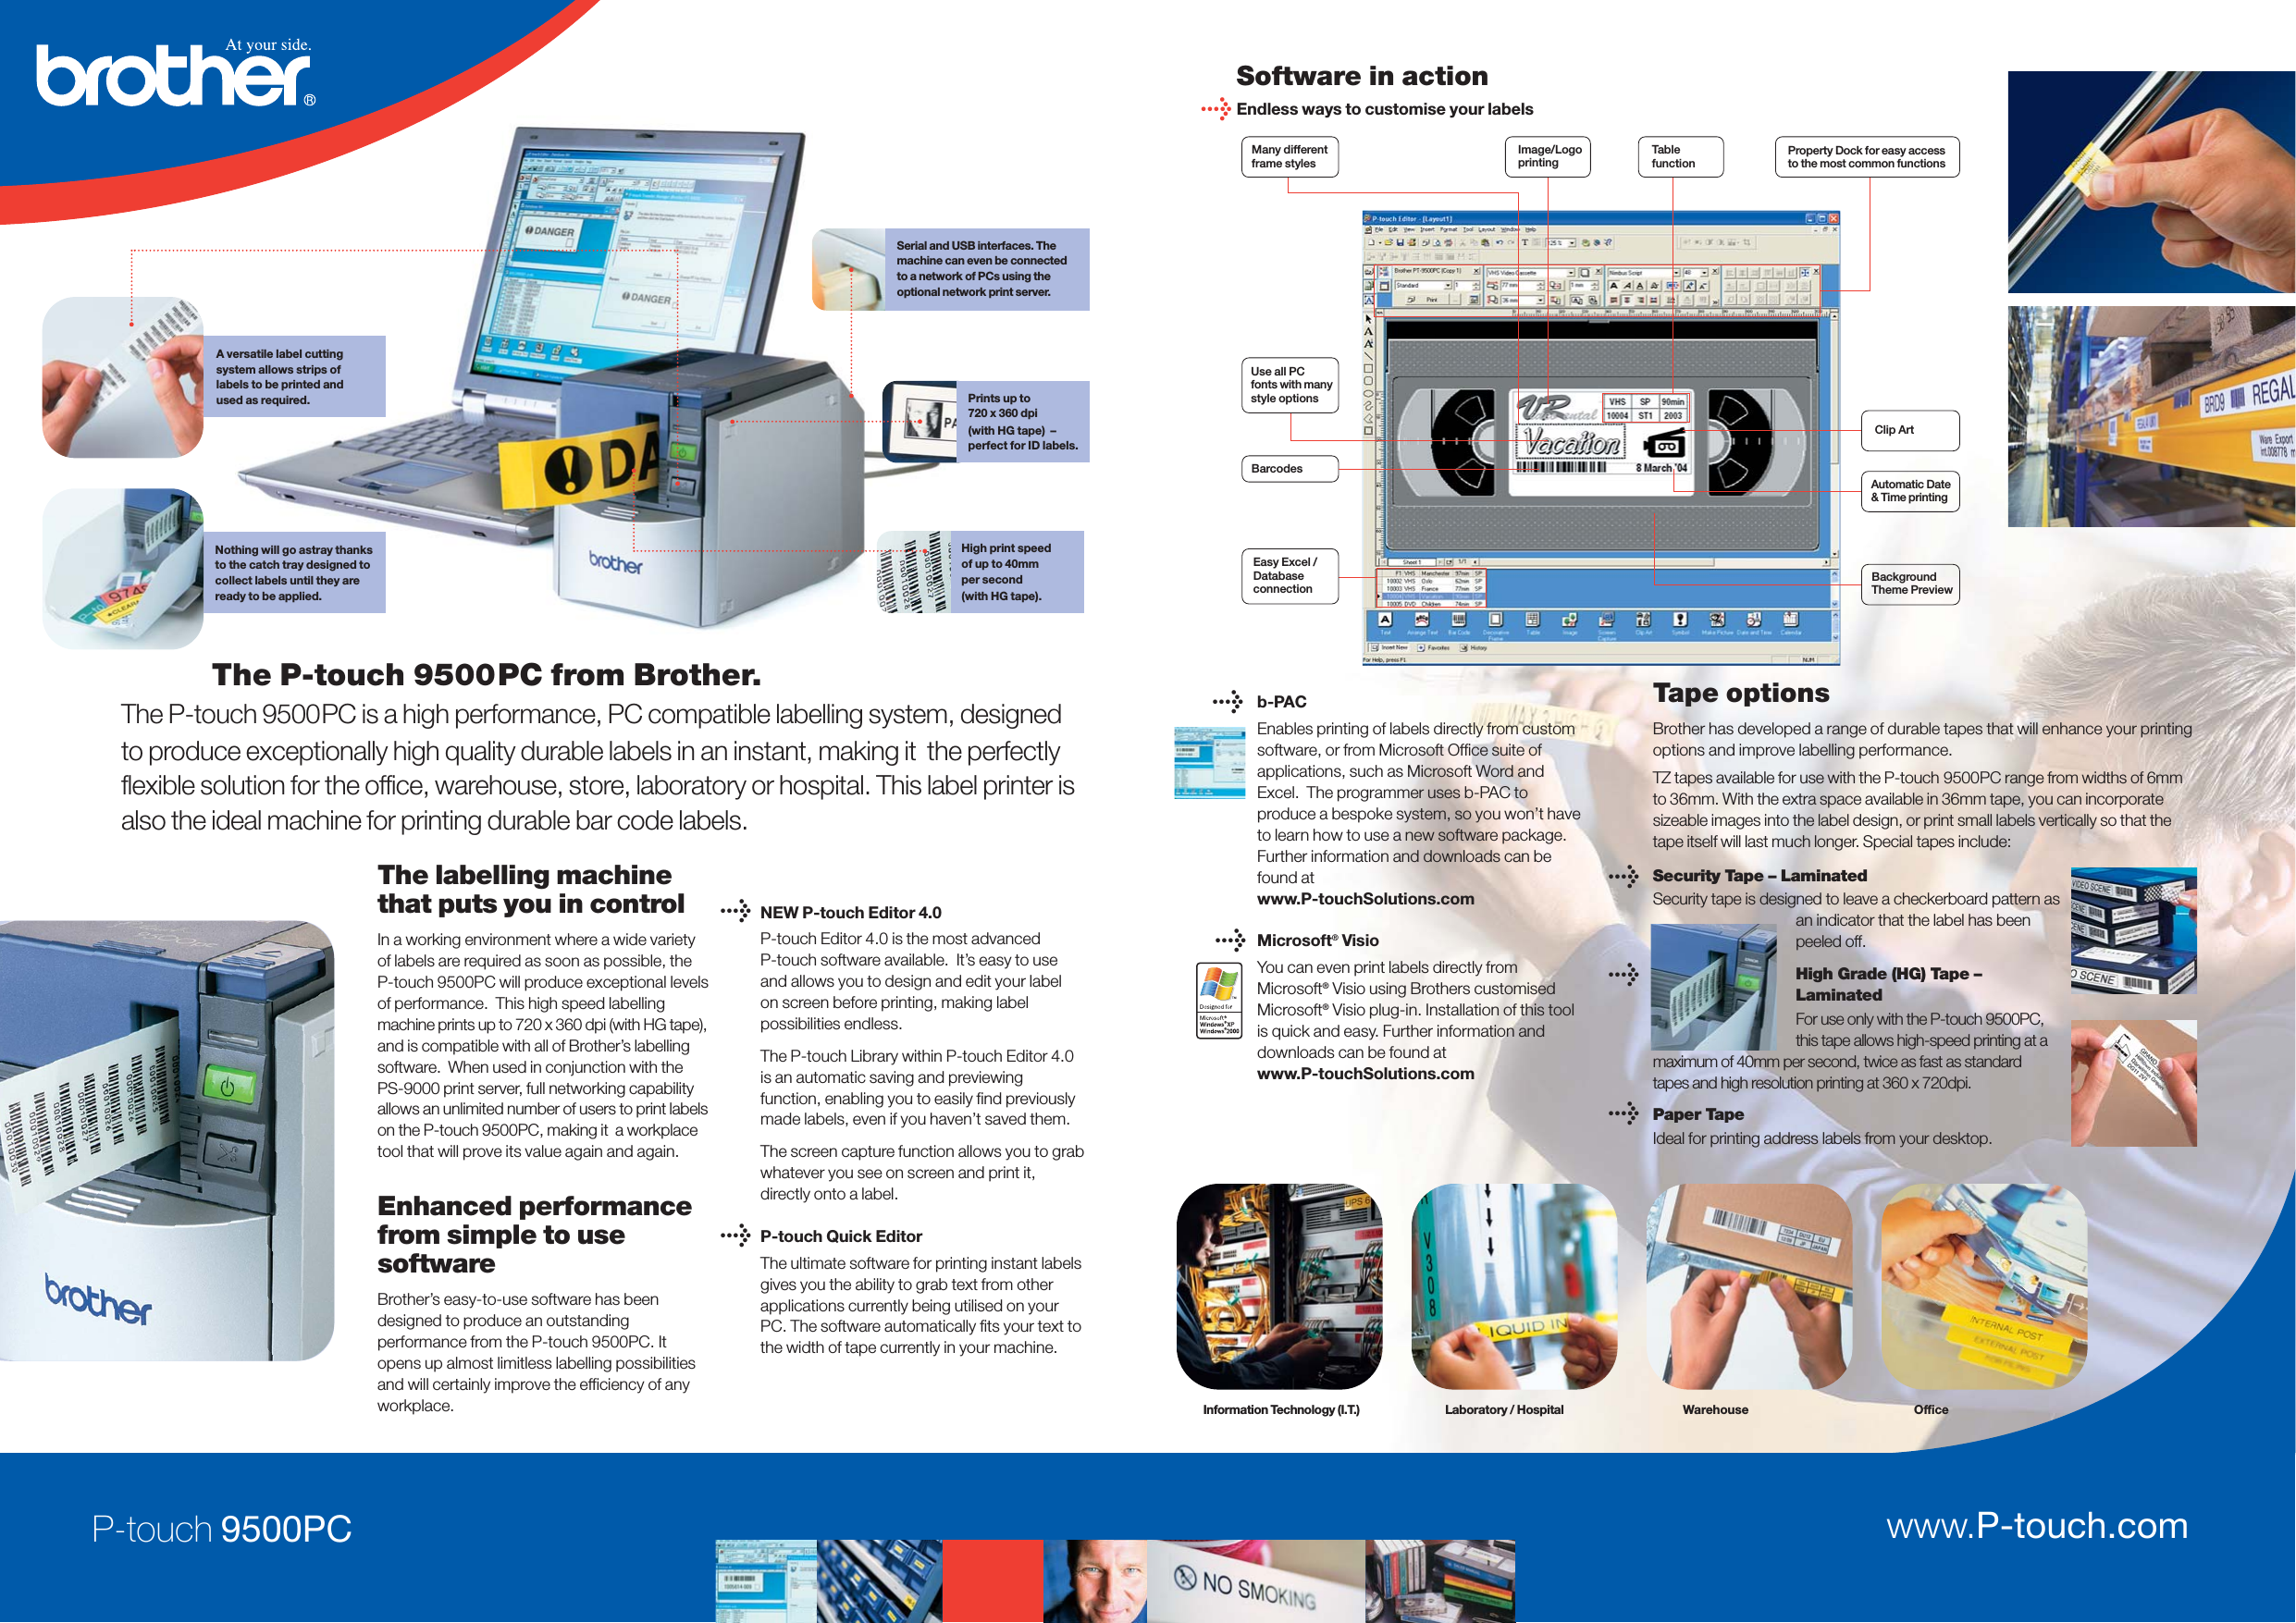 LabelZone Pt 9500 5260/Brother/PT9500/BUK User Manual